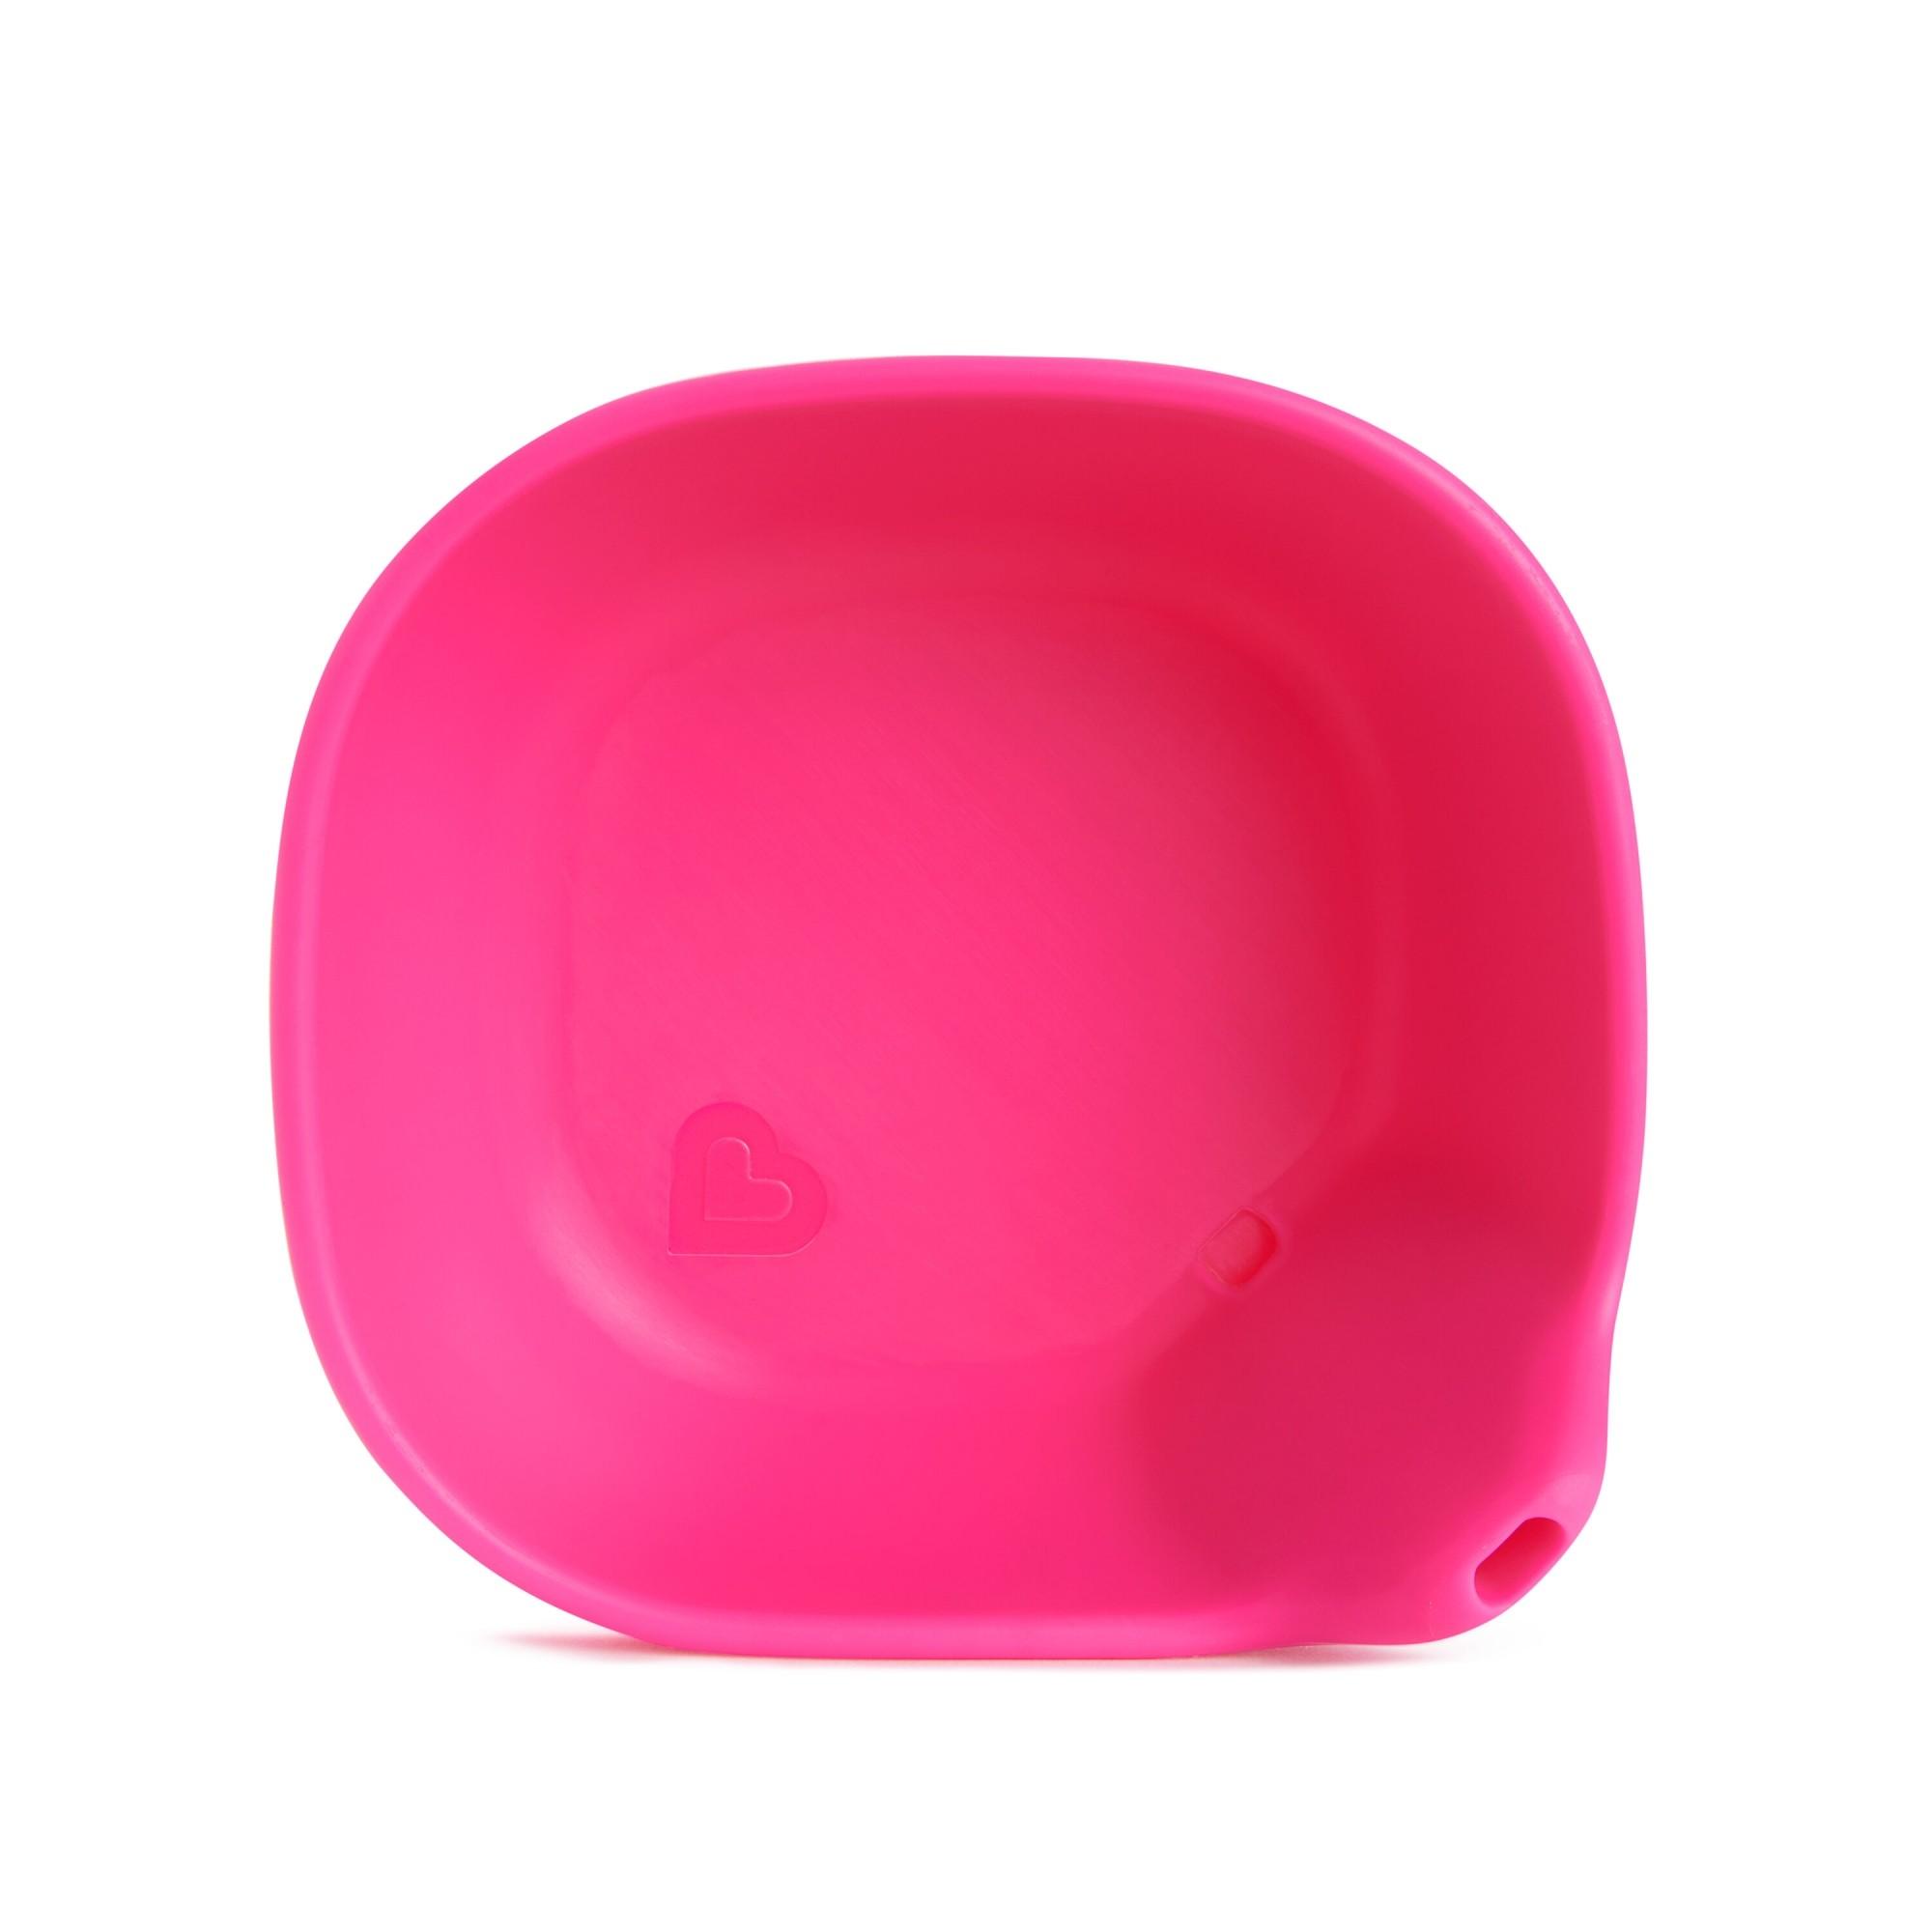 Tigela de Silicone Rosa - Munchkin